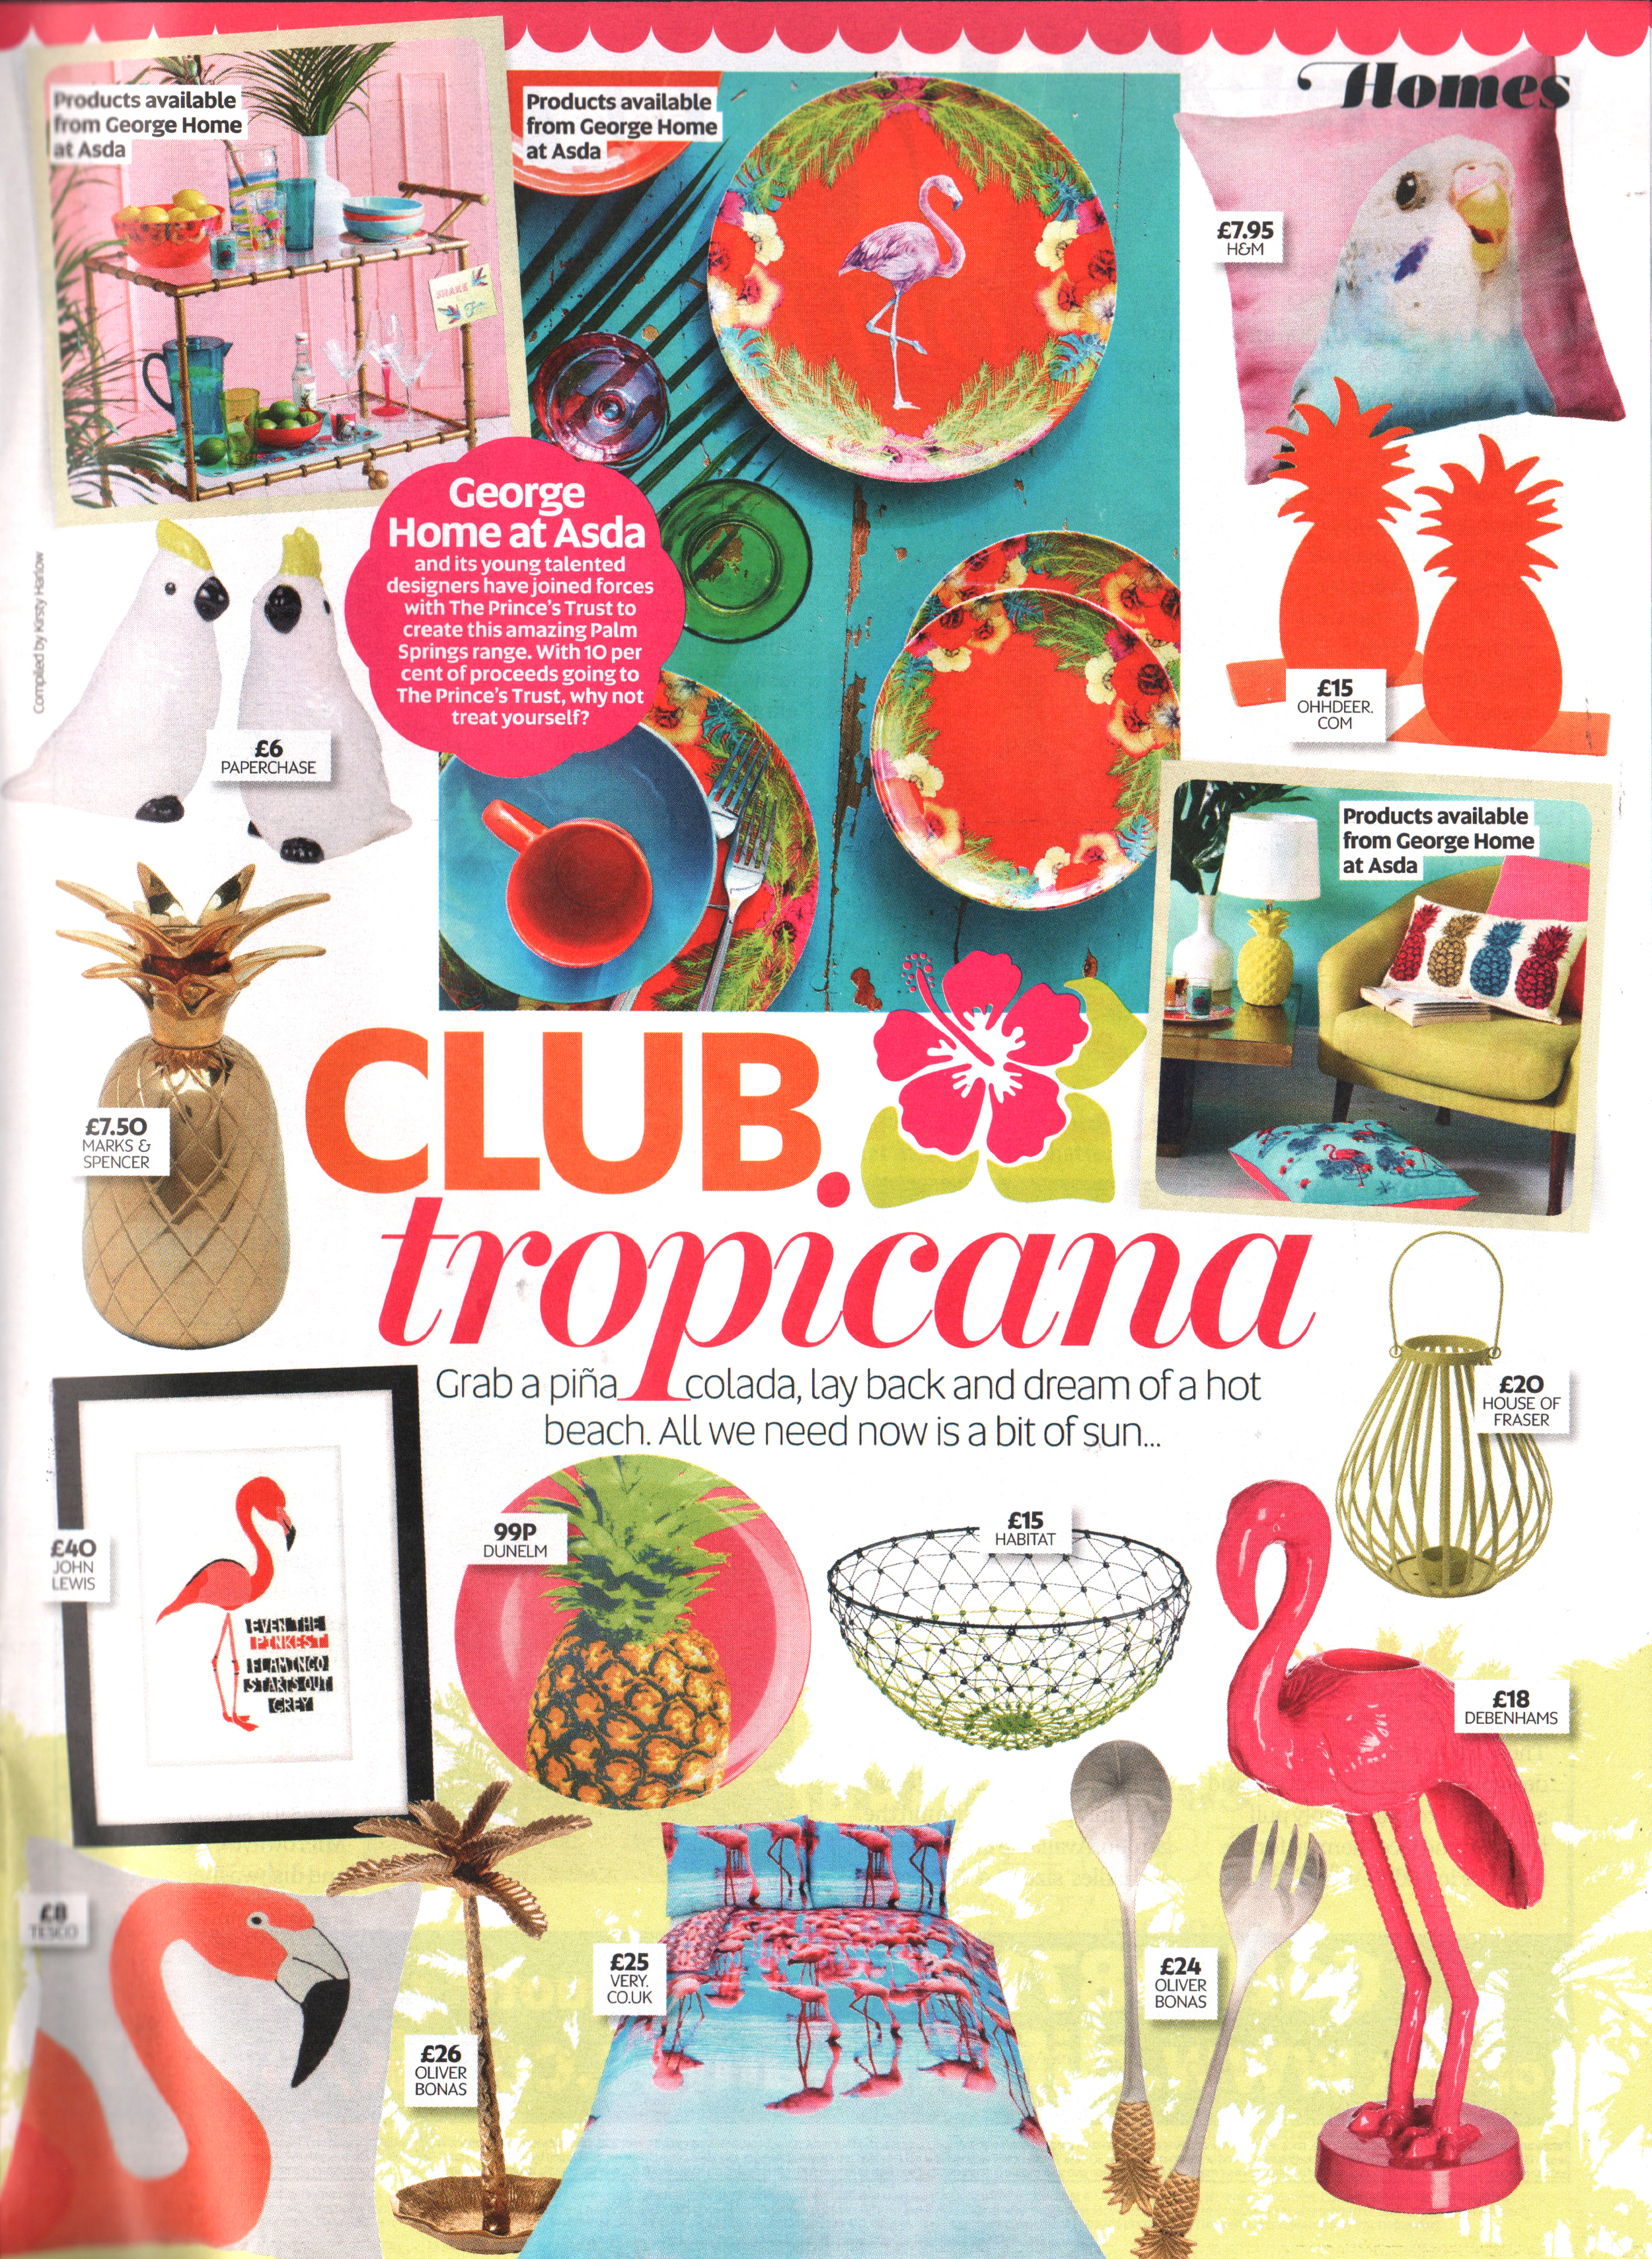 NOW Magazine, 20th April 2015